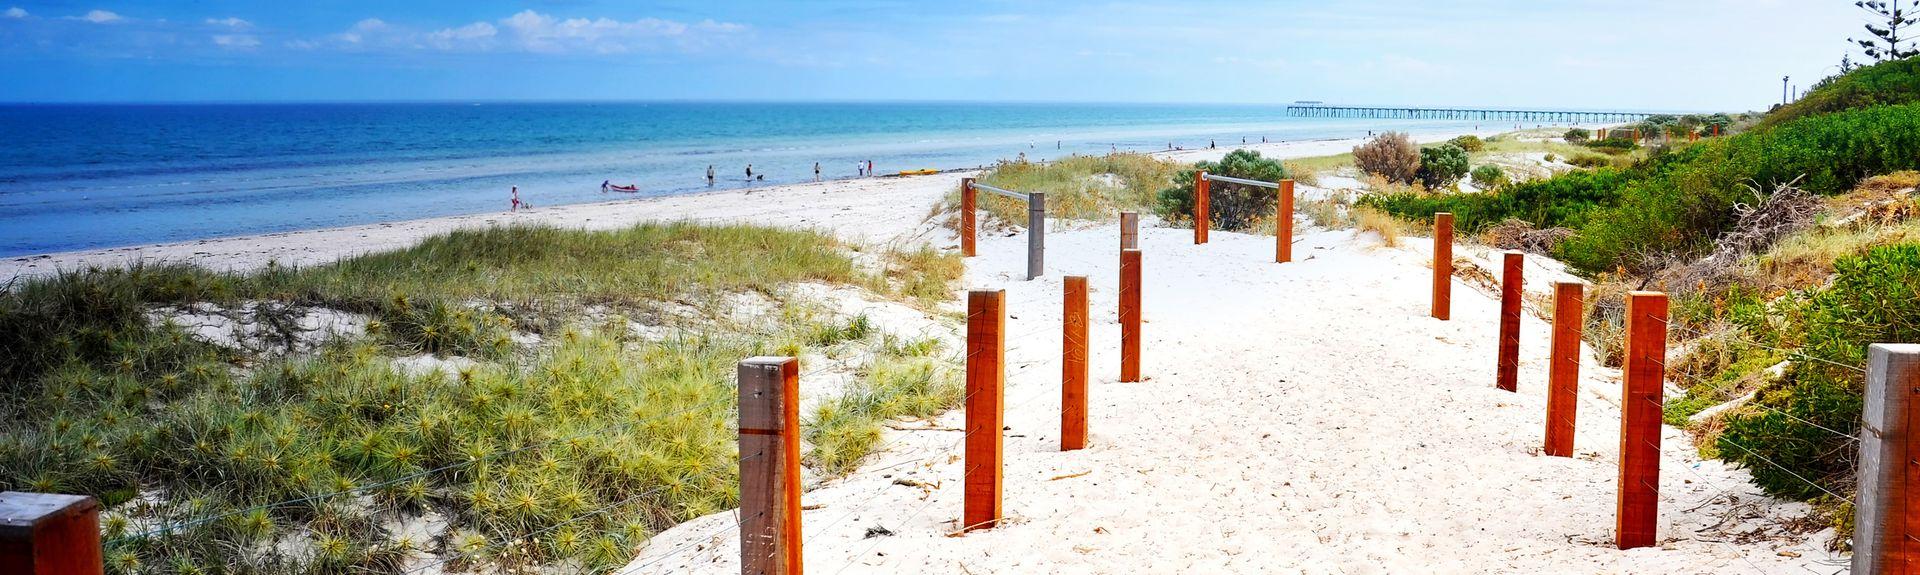 Henley Beach, Adelaide, South Australia, Australia